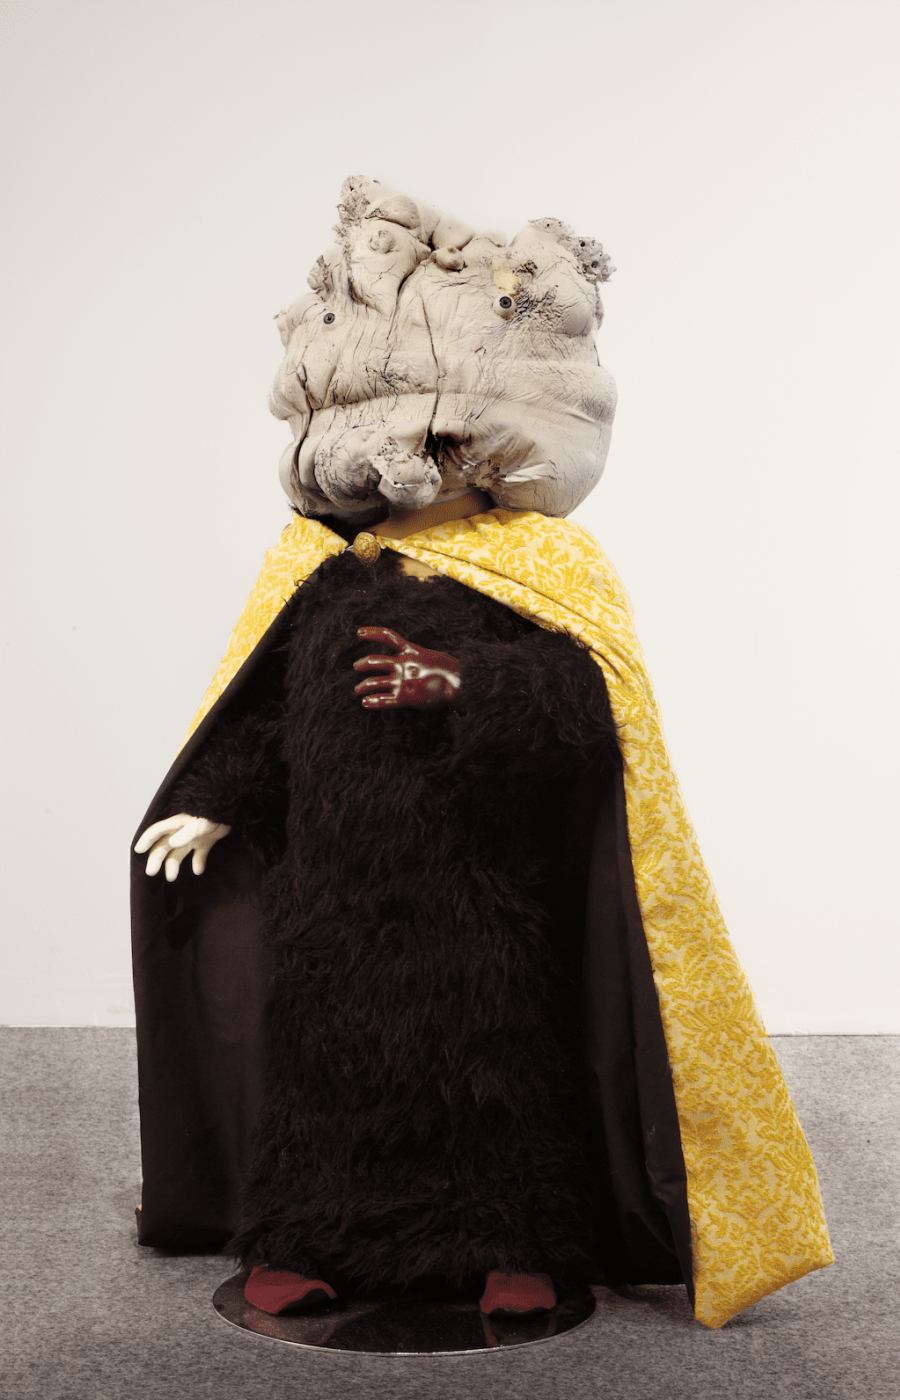 <b>Neil Farber</b>, <em>Mannys</em>, plâtre, résine, tissus, 2011